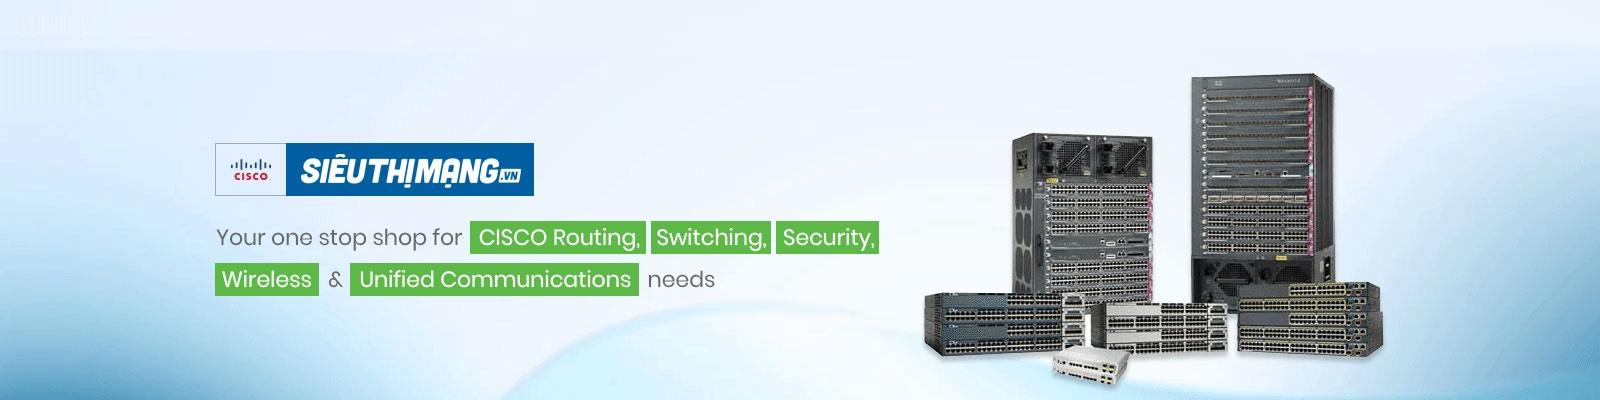 Switch Cisco Catalyst 2960, 2960X, 2960L, 3650, 3850, 9200, 9200L, 9300, 9300L, Module SFP, SFP+ Switch PoE+